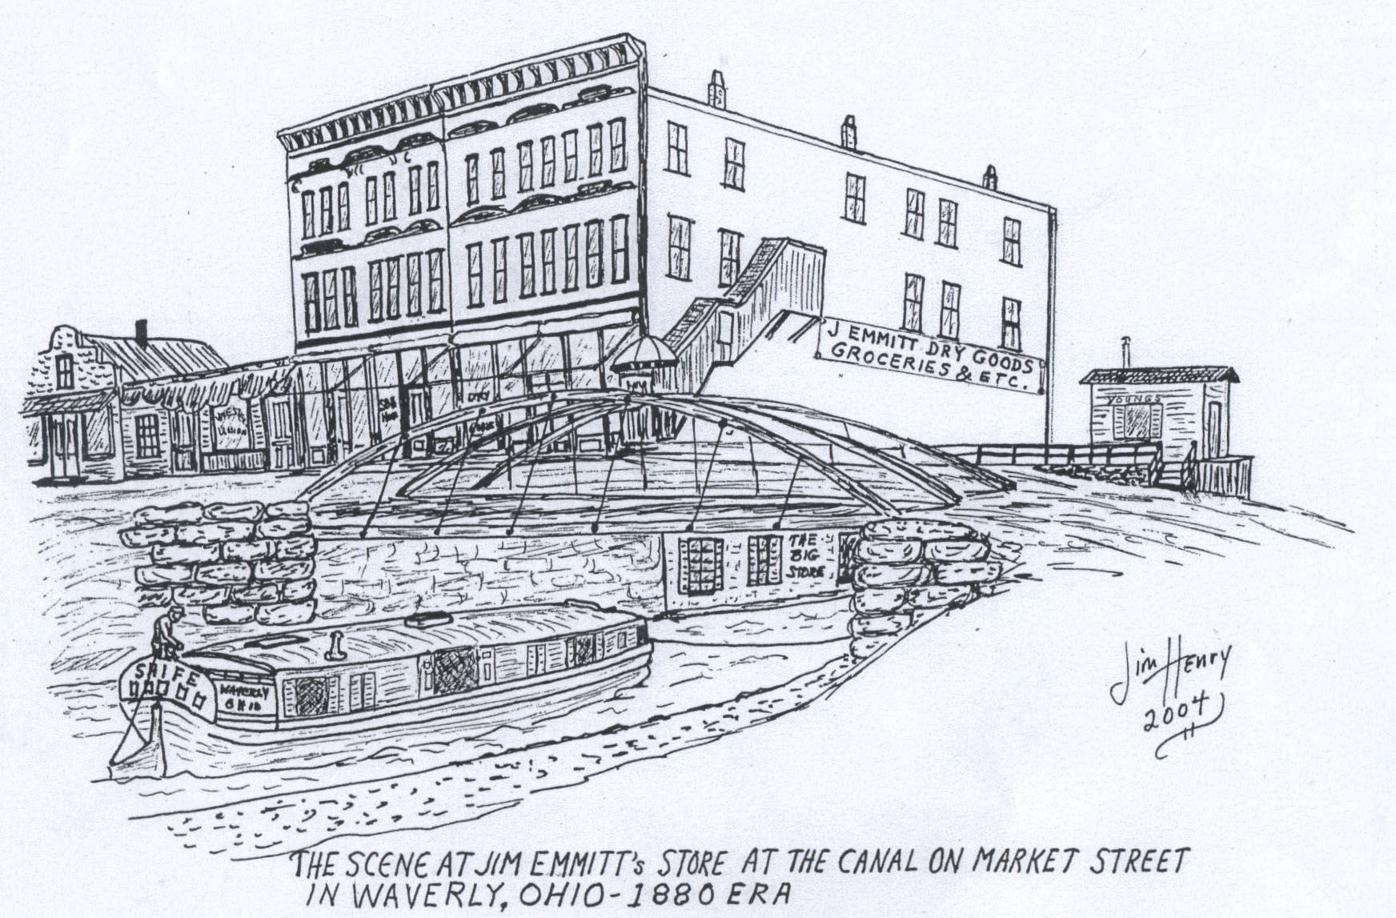 Greenbaum building and canal sketch